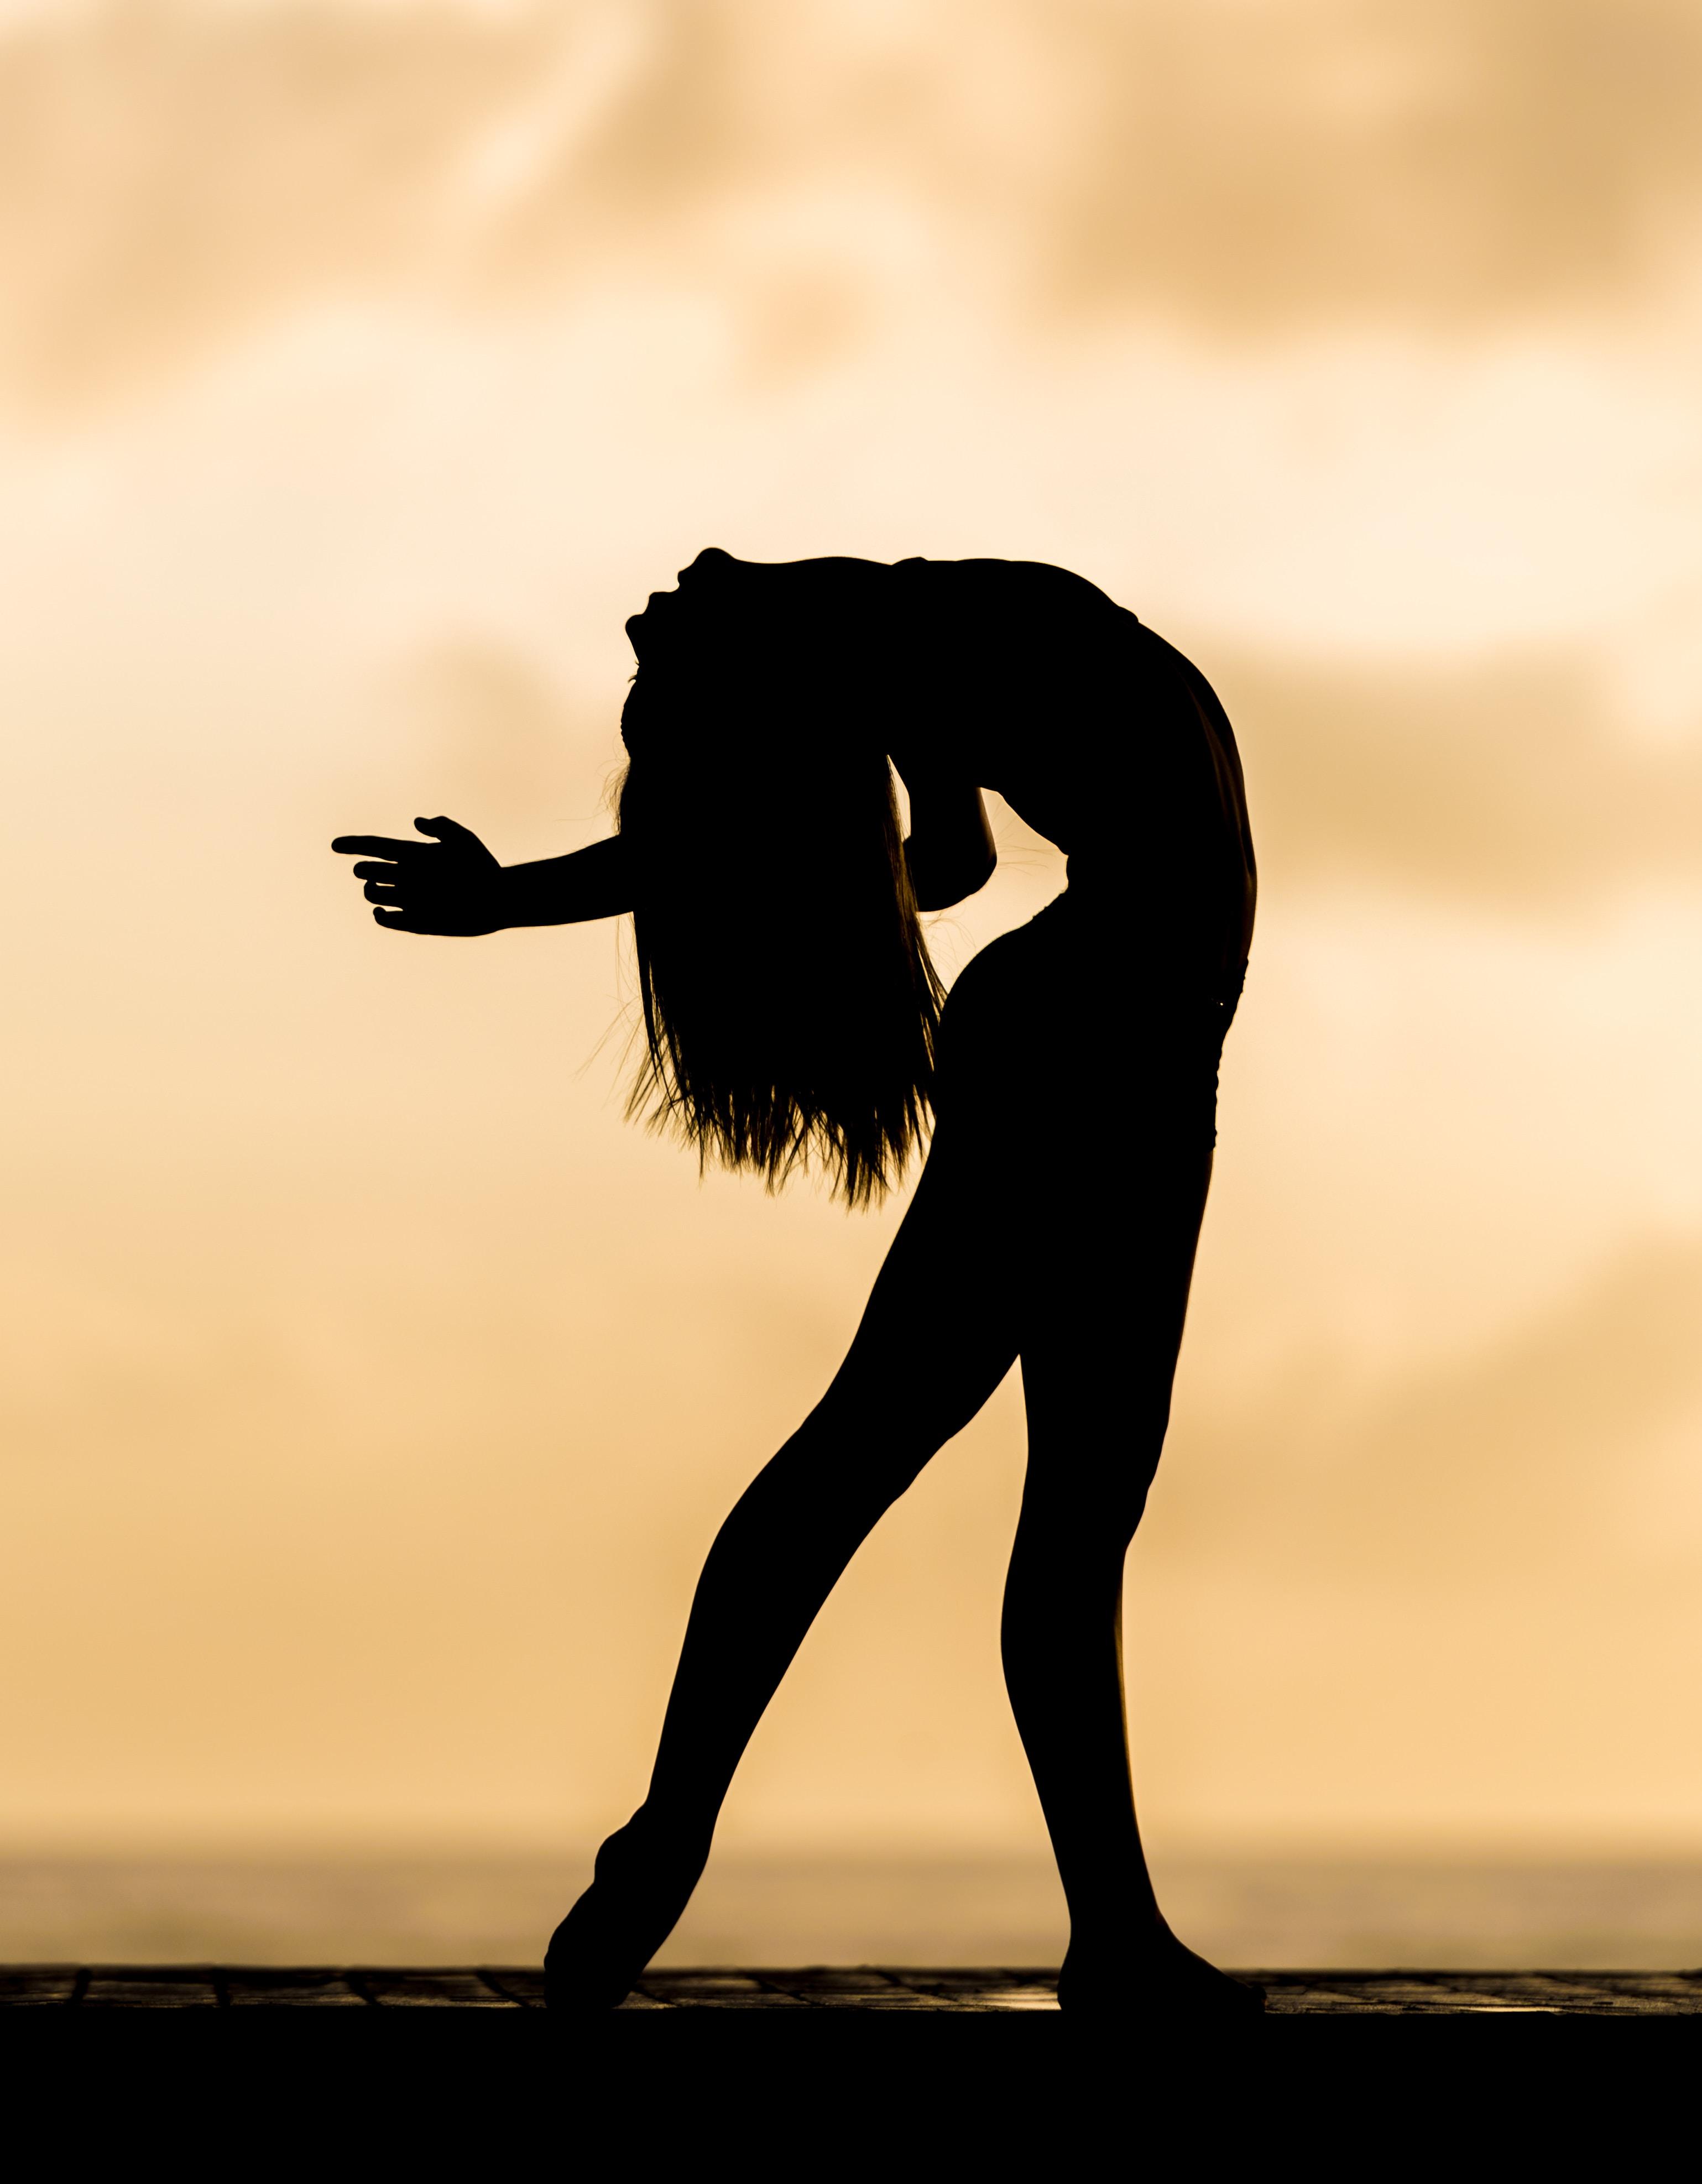 Dancing hips #marriage stories